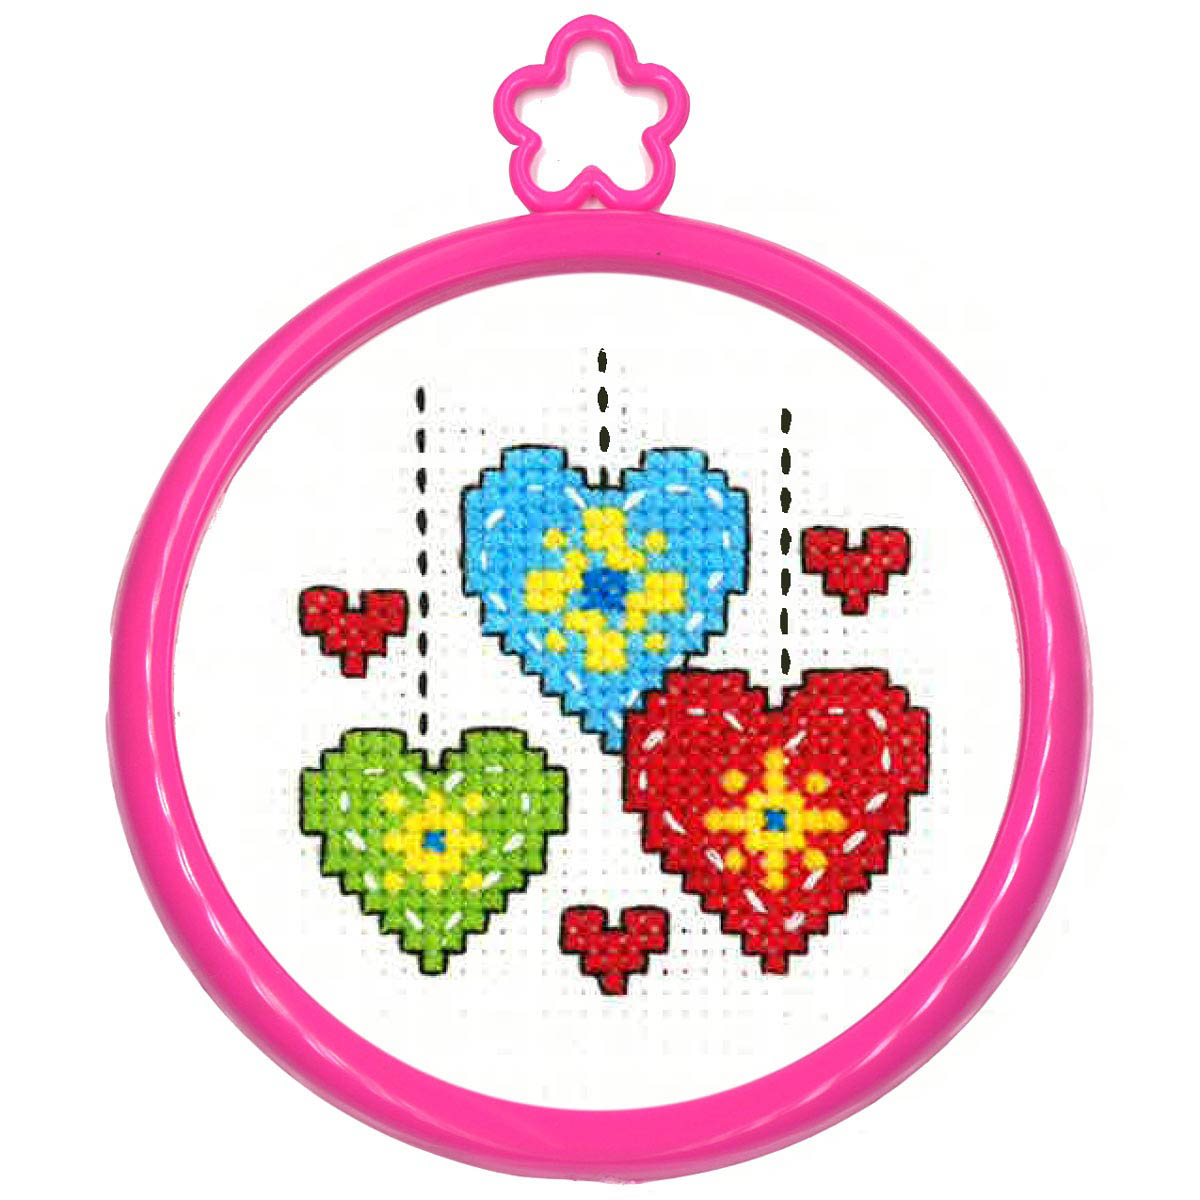 Bucilla ® My 1st Stitch™ - Counted Cross Stitch Kits - Mini - Hearts